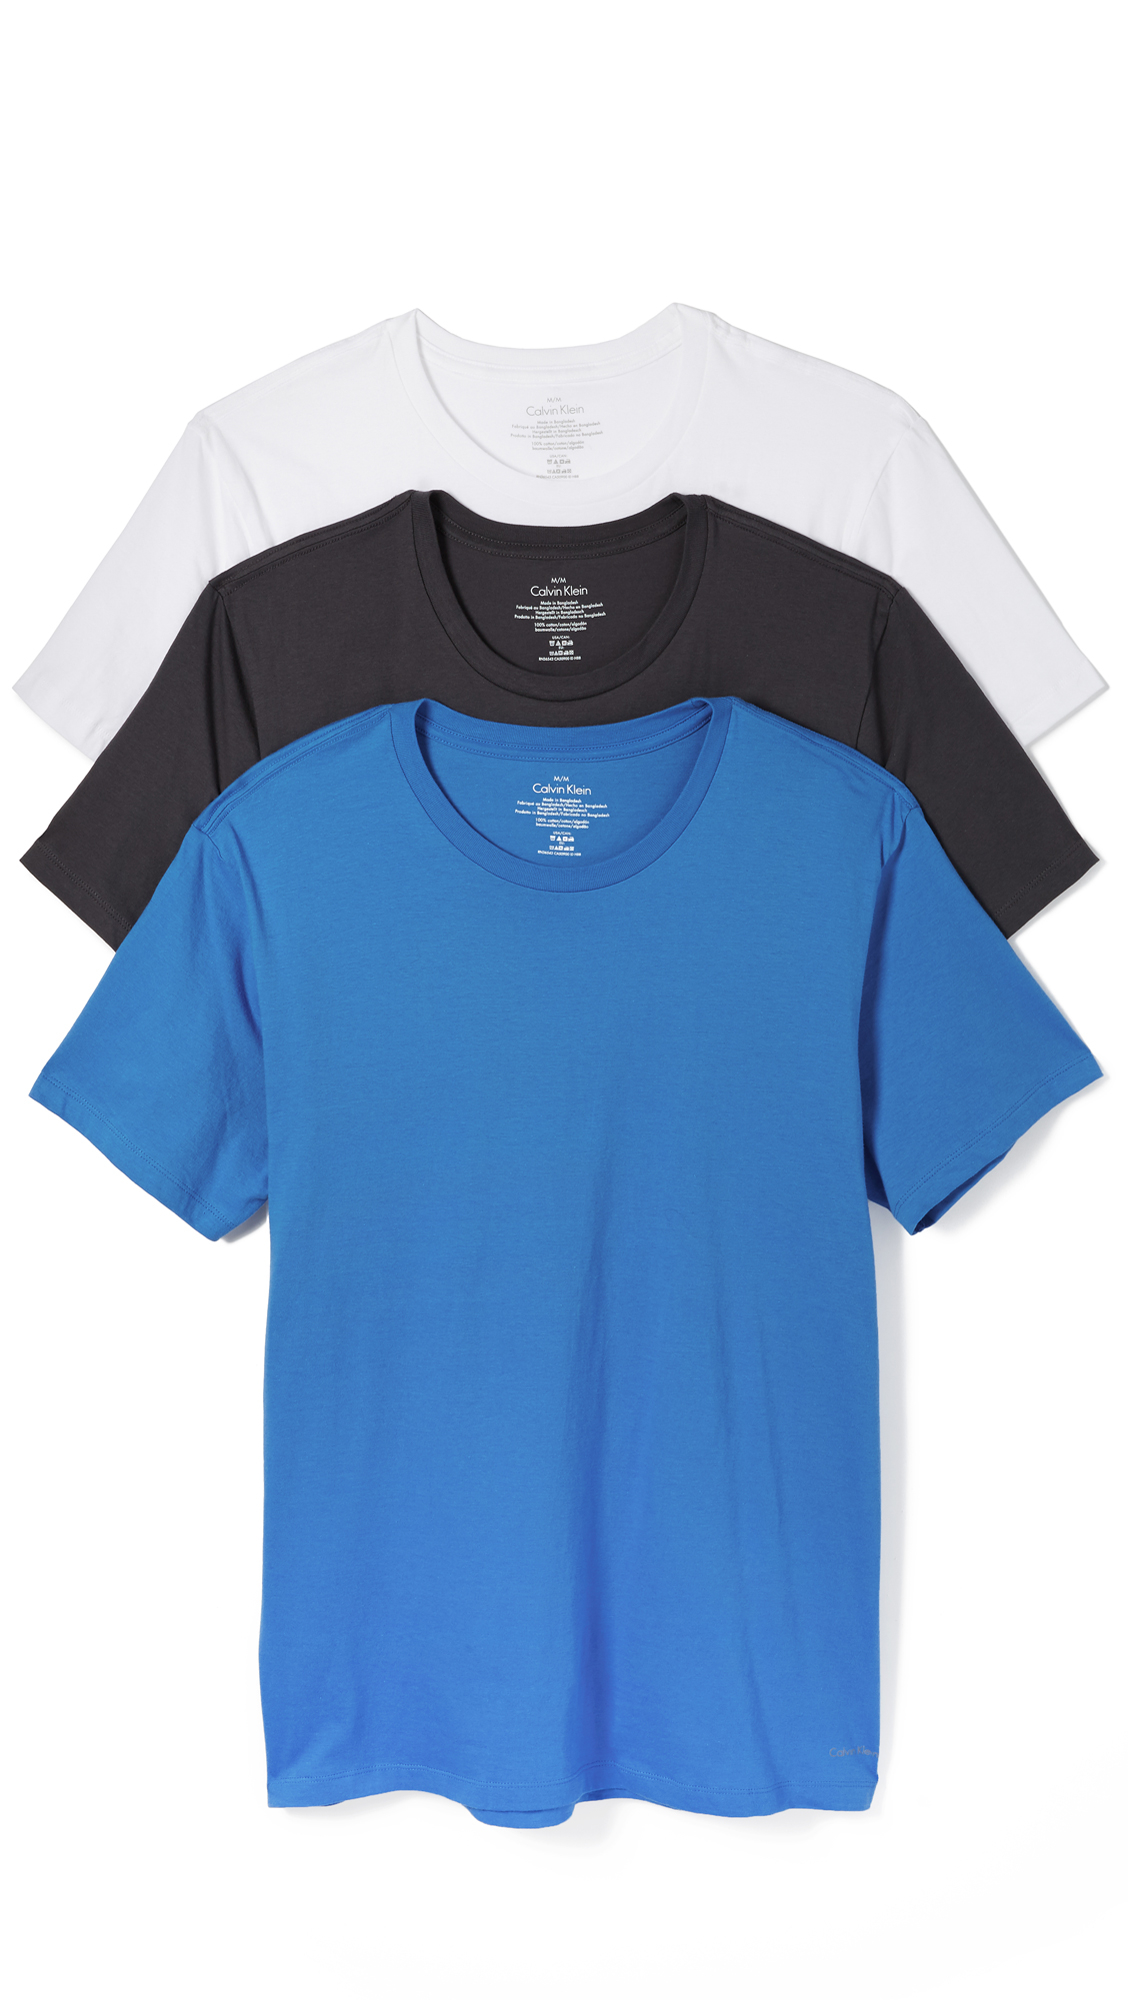 d579a3d0c426 Calvin Klein Cotton Classic 3 Pack Crew Neck Tee in Blue for Men - Lyst